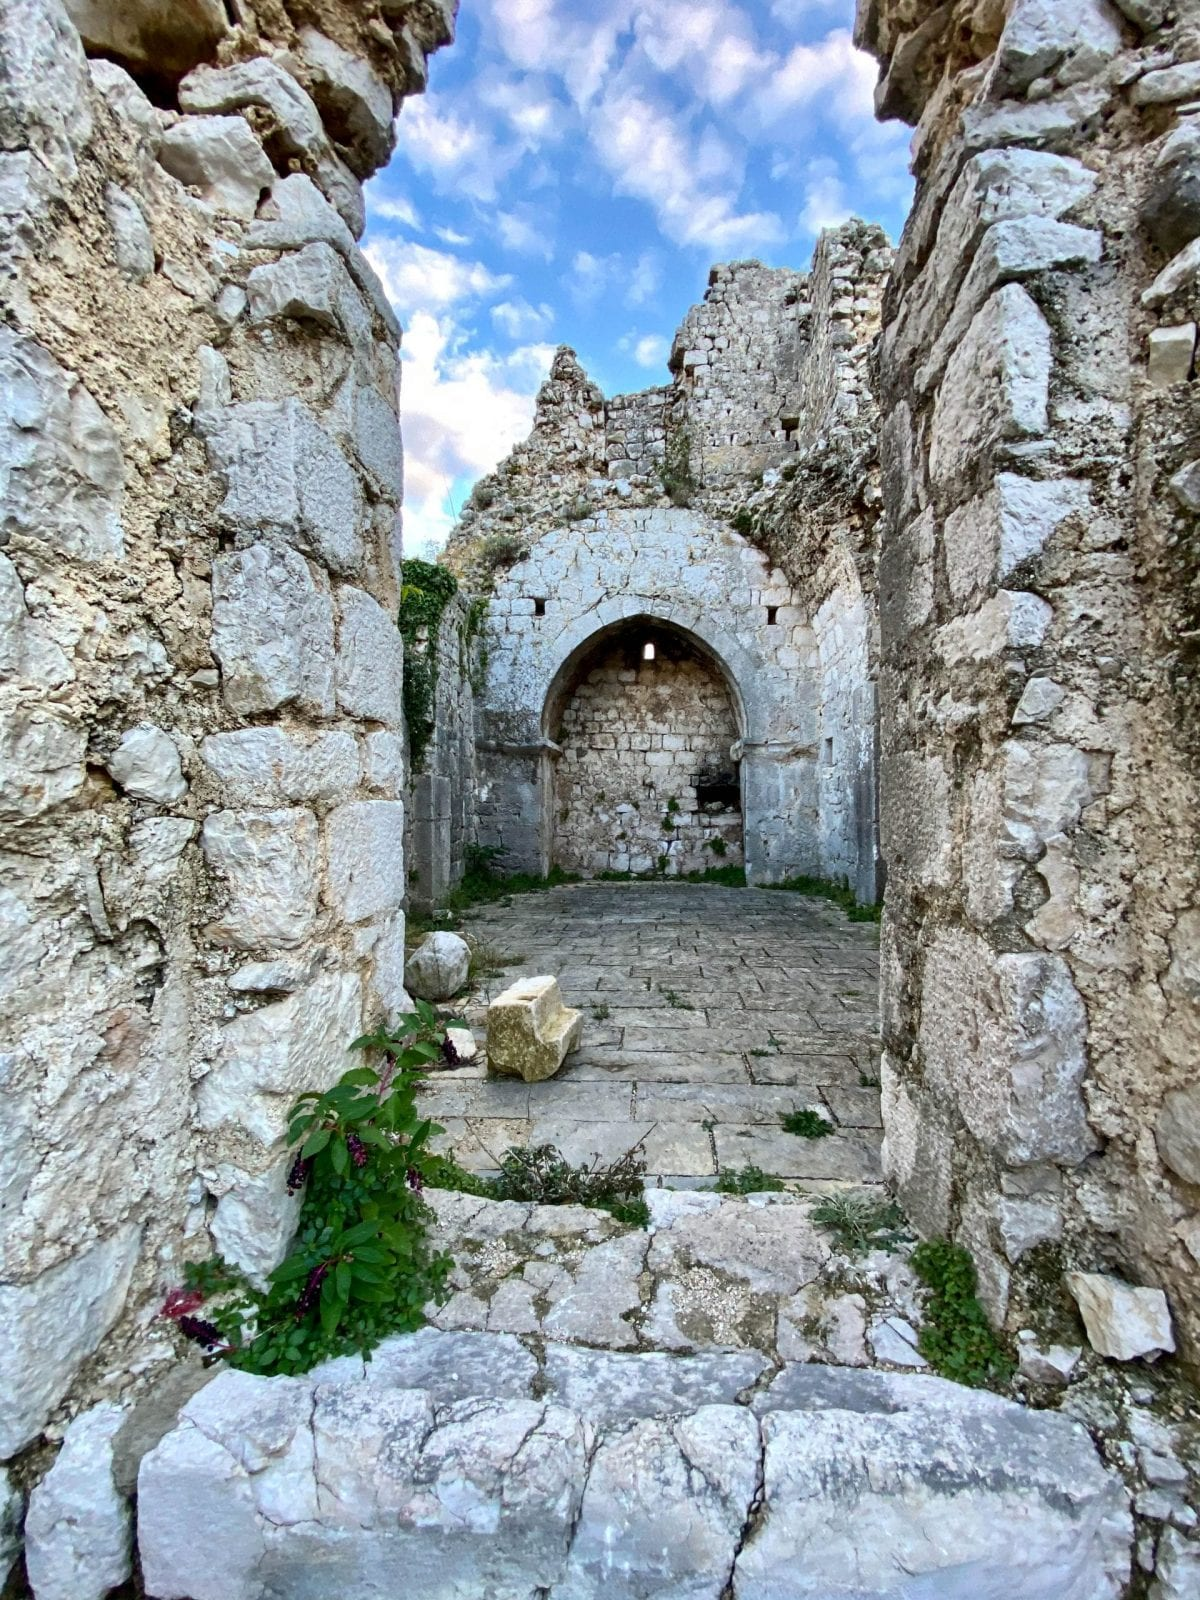 Vrana Castle